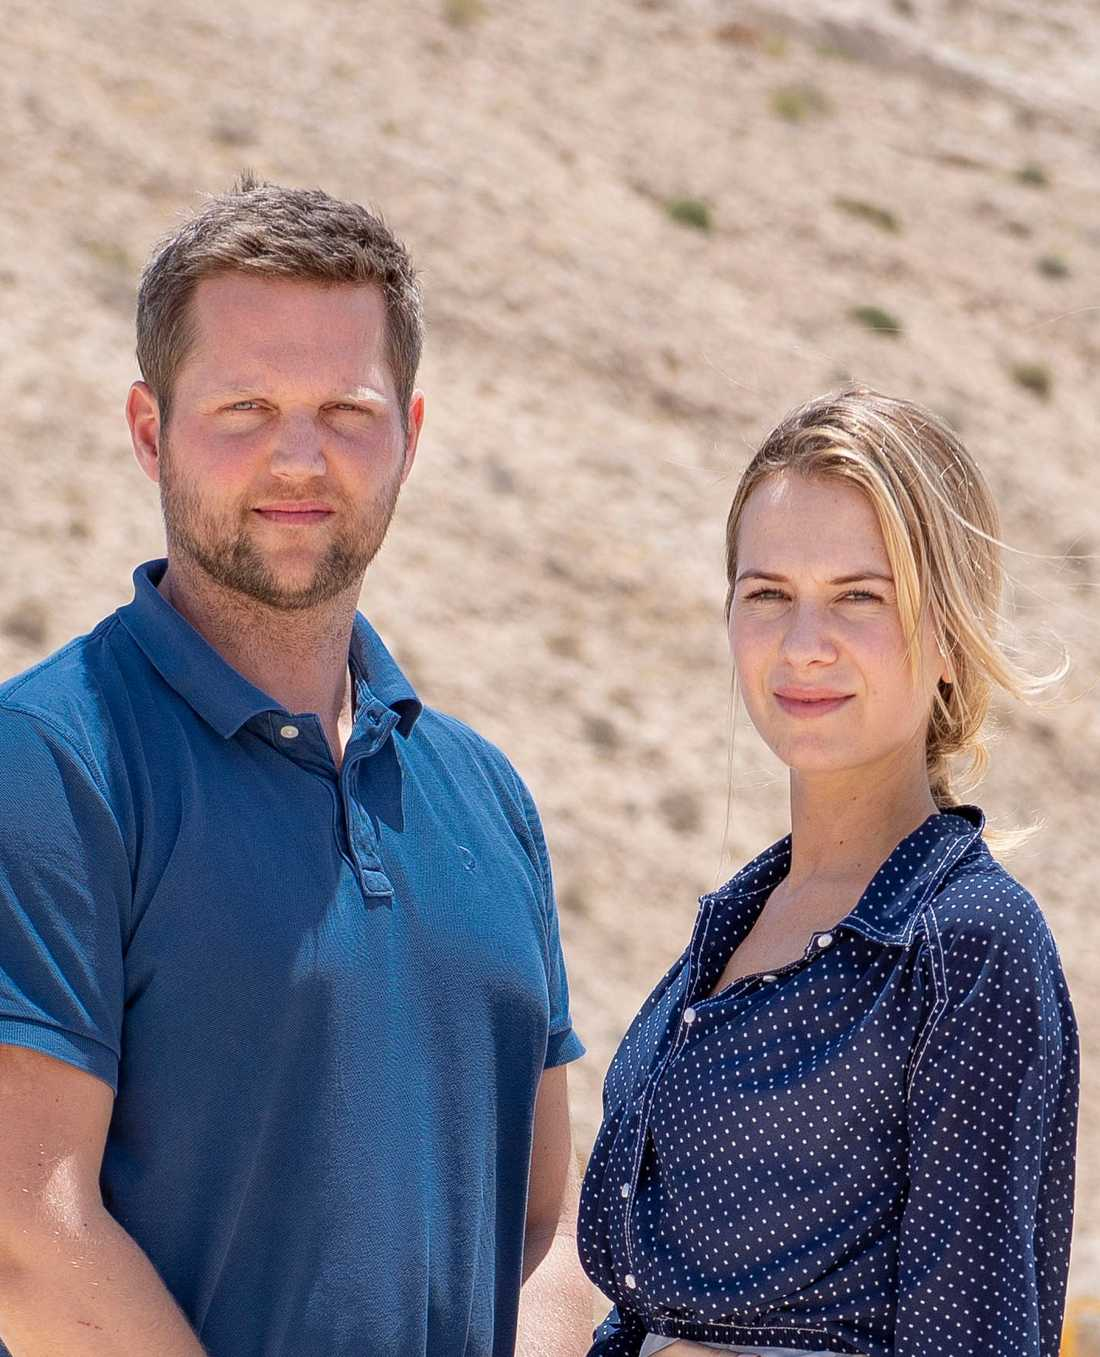 Aftonbladets Marcus Eriksson och Cecilia Wugk på plats i Oman.